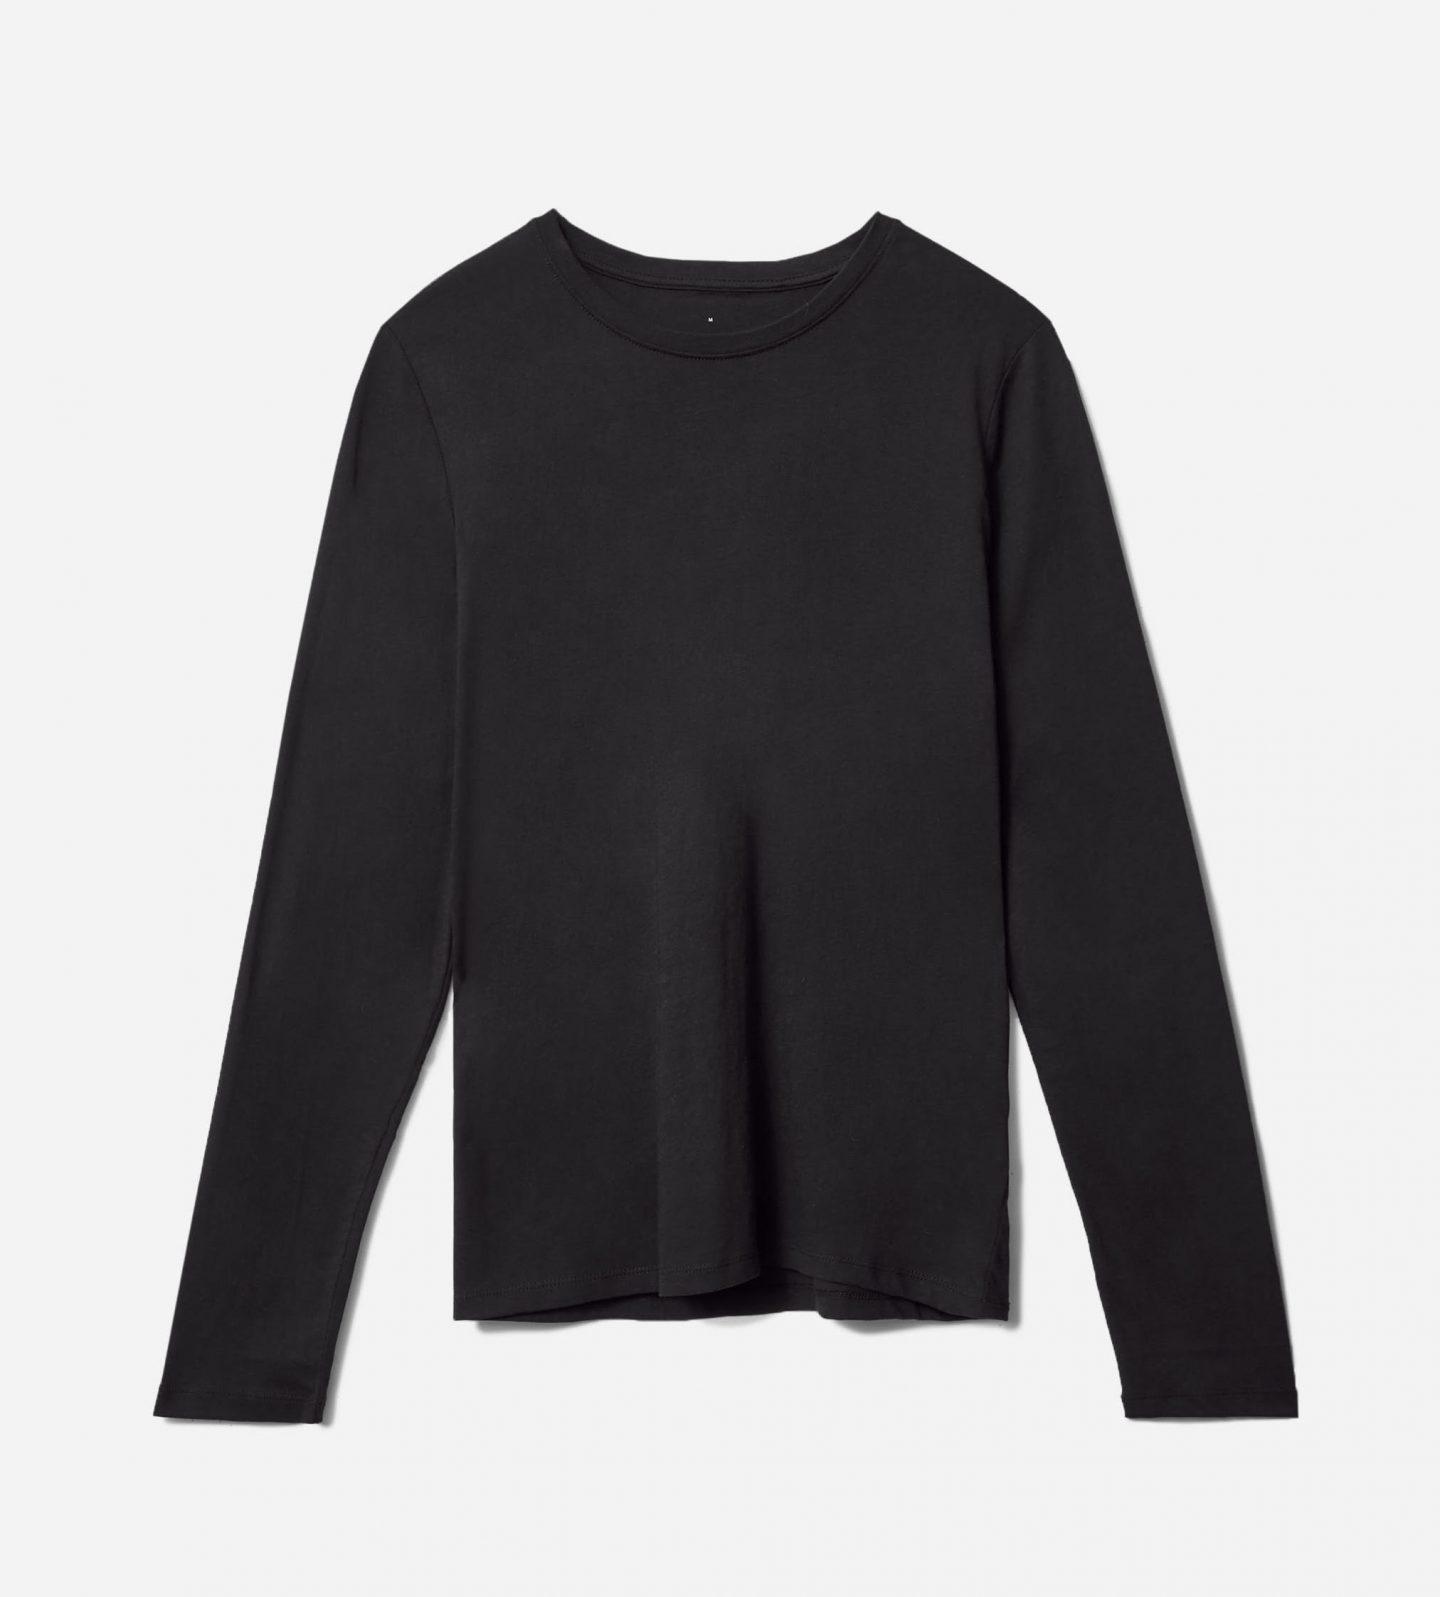 Sustainable black long sleeve top